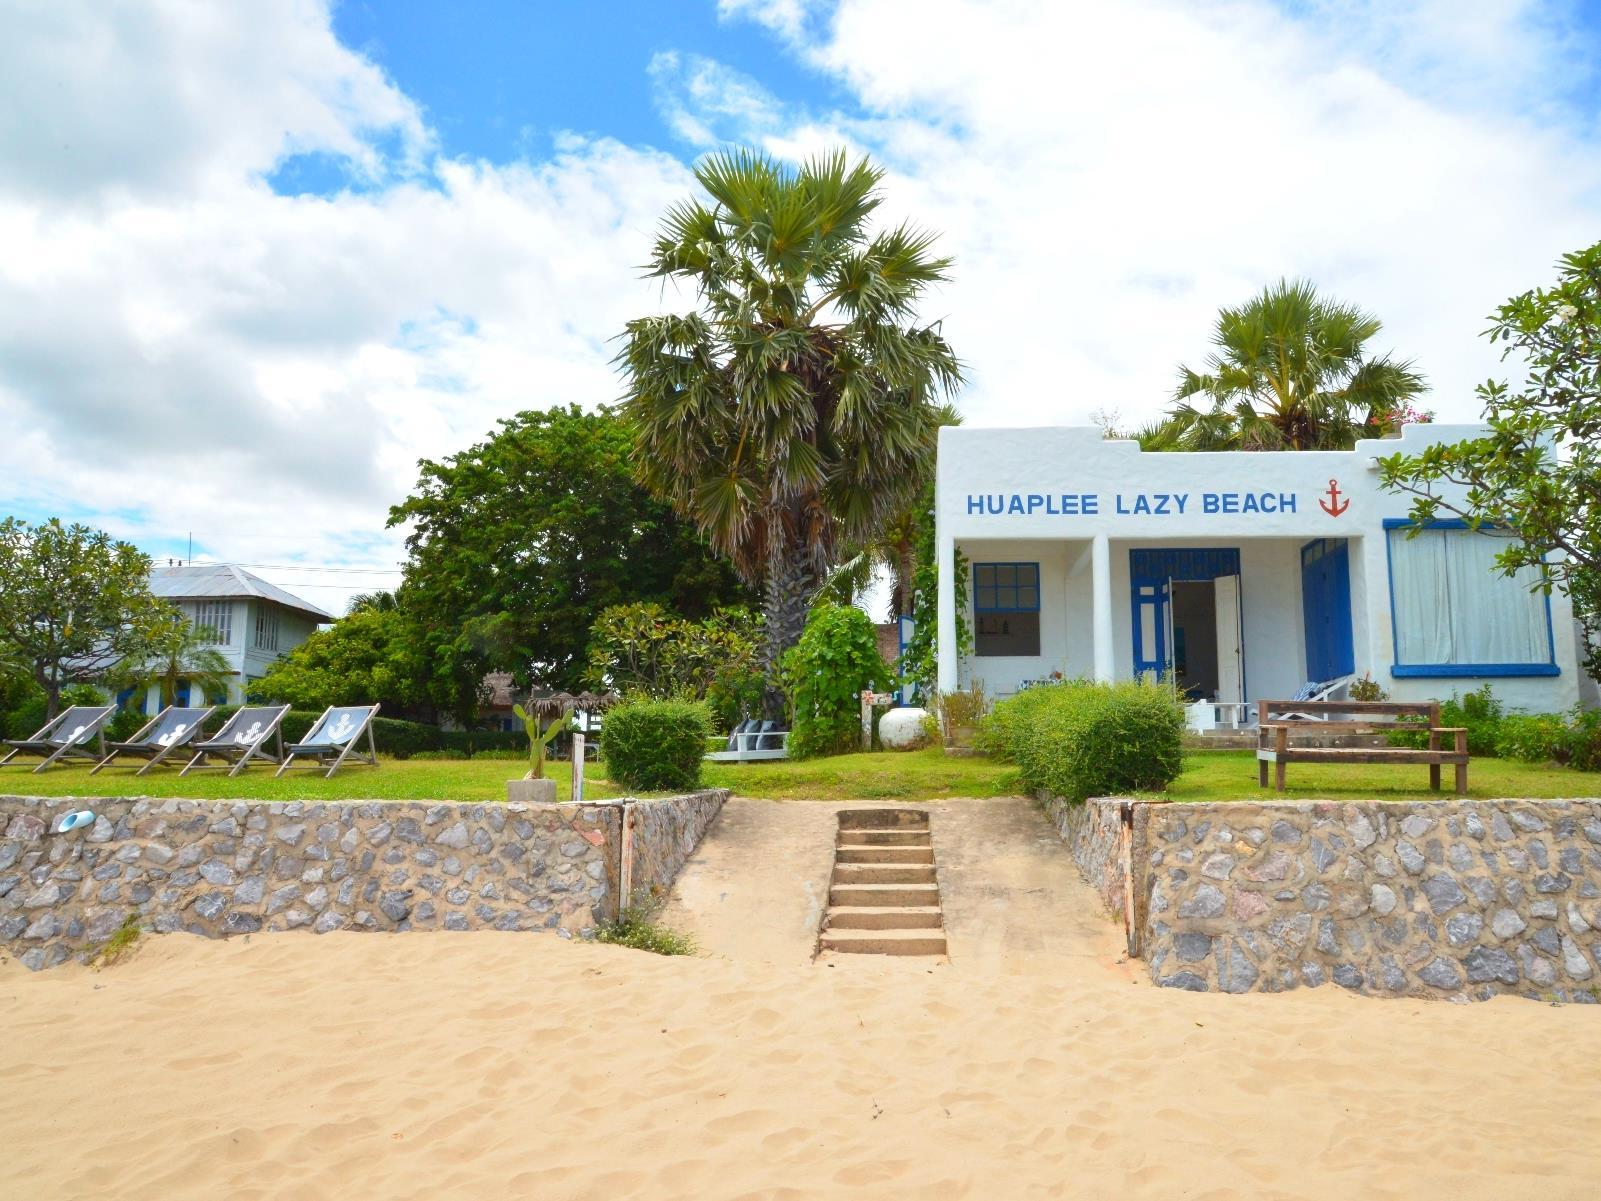 Hua Plee Lazy Beach Hotel